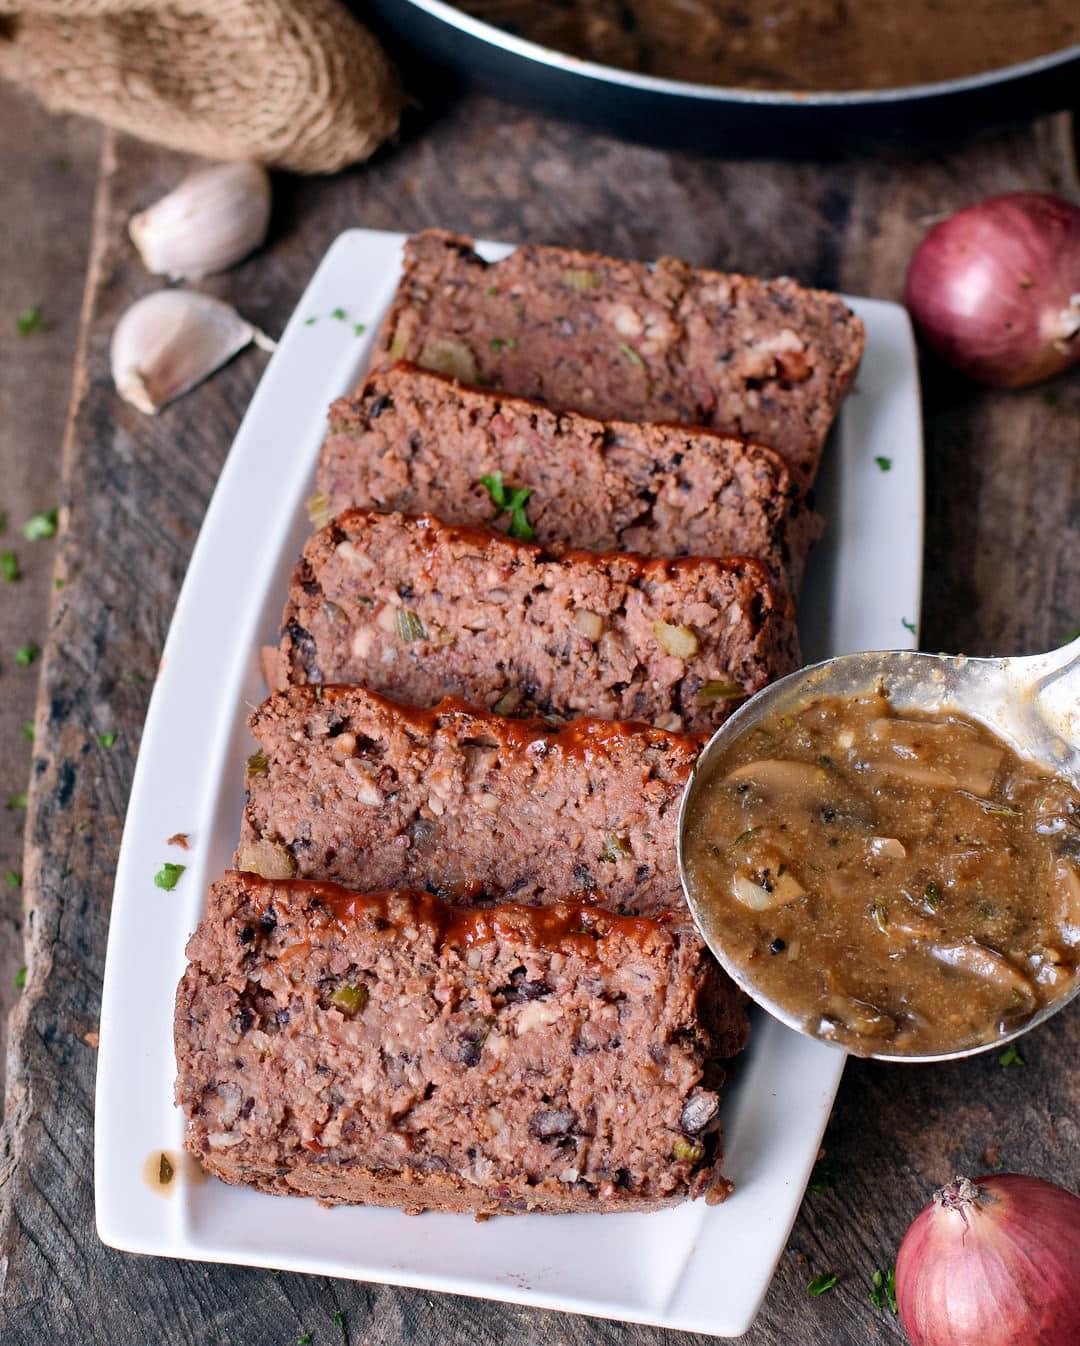 Vegan meatloaf with mushroom sauce (gravy)